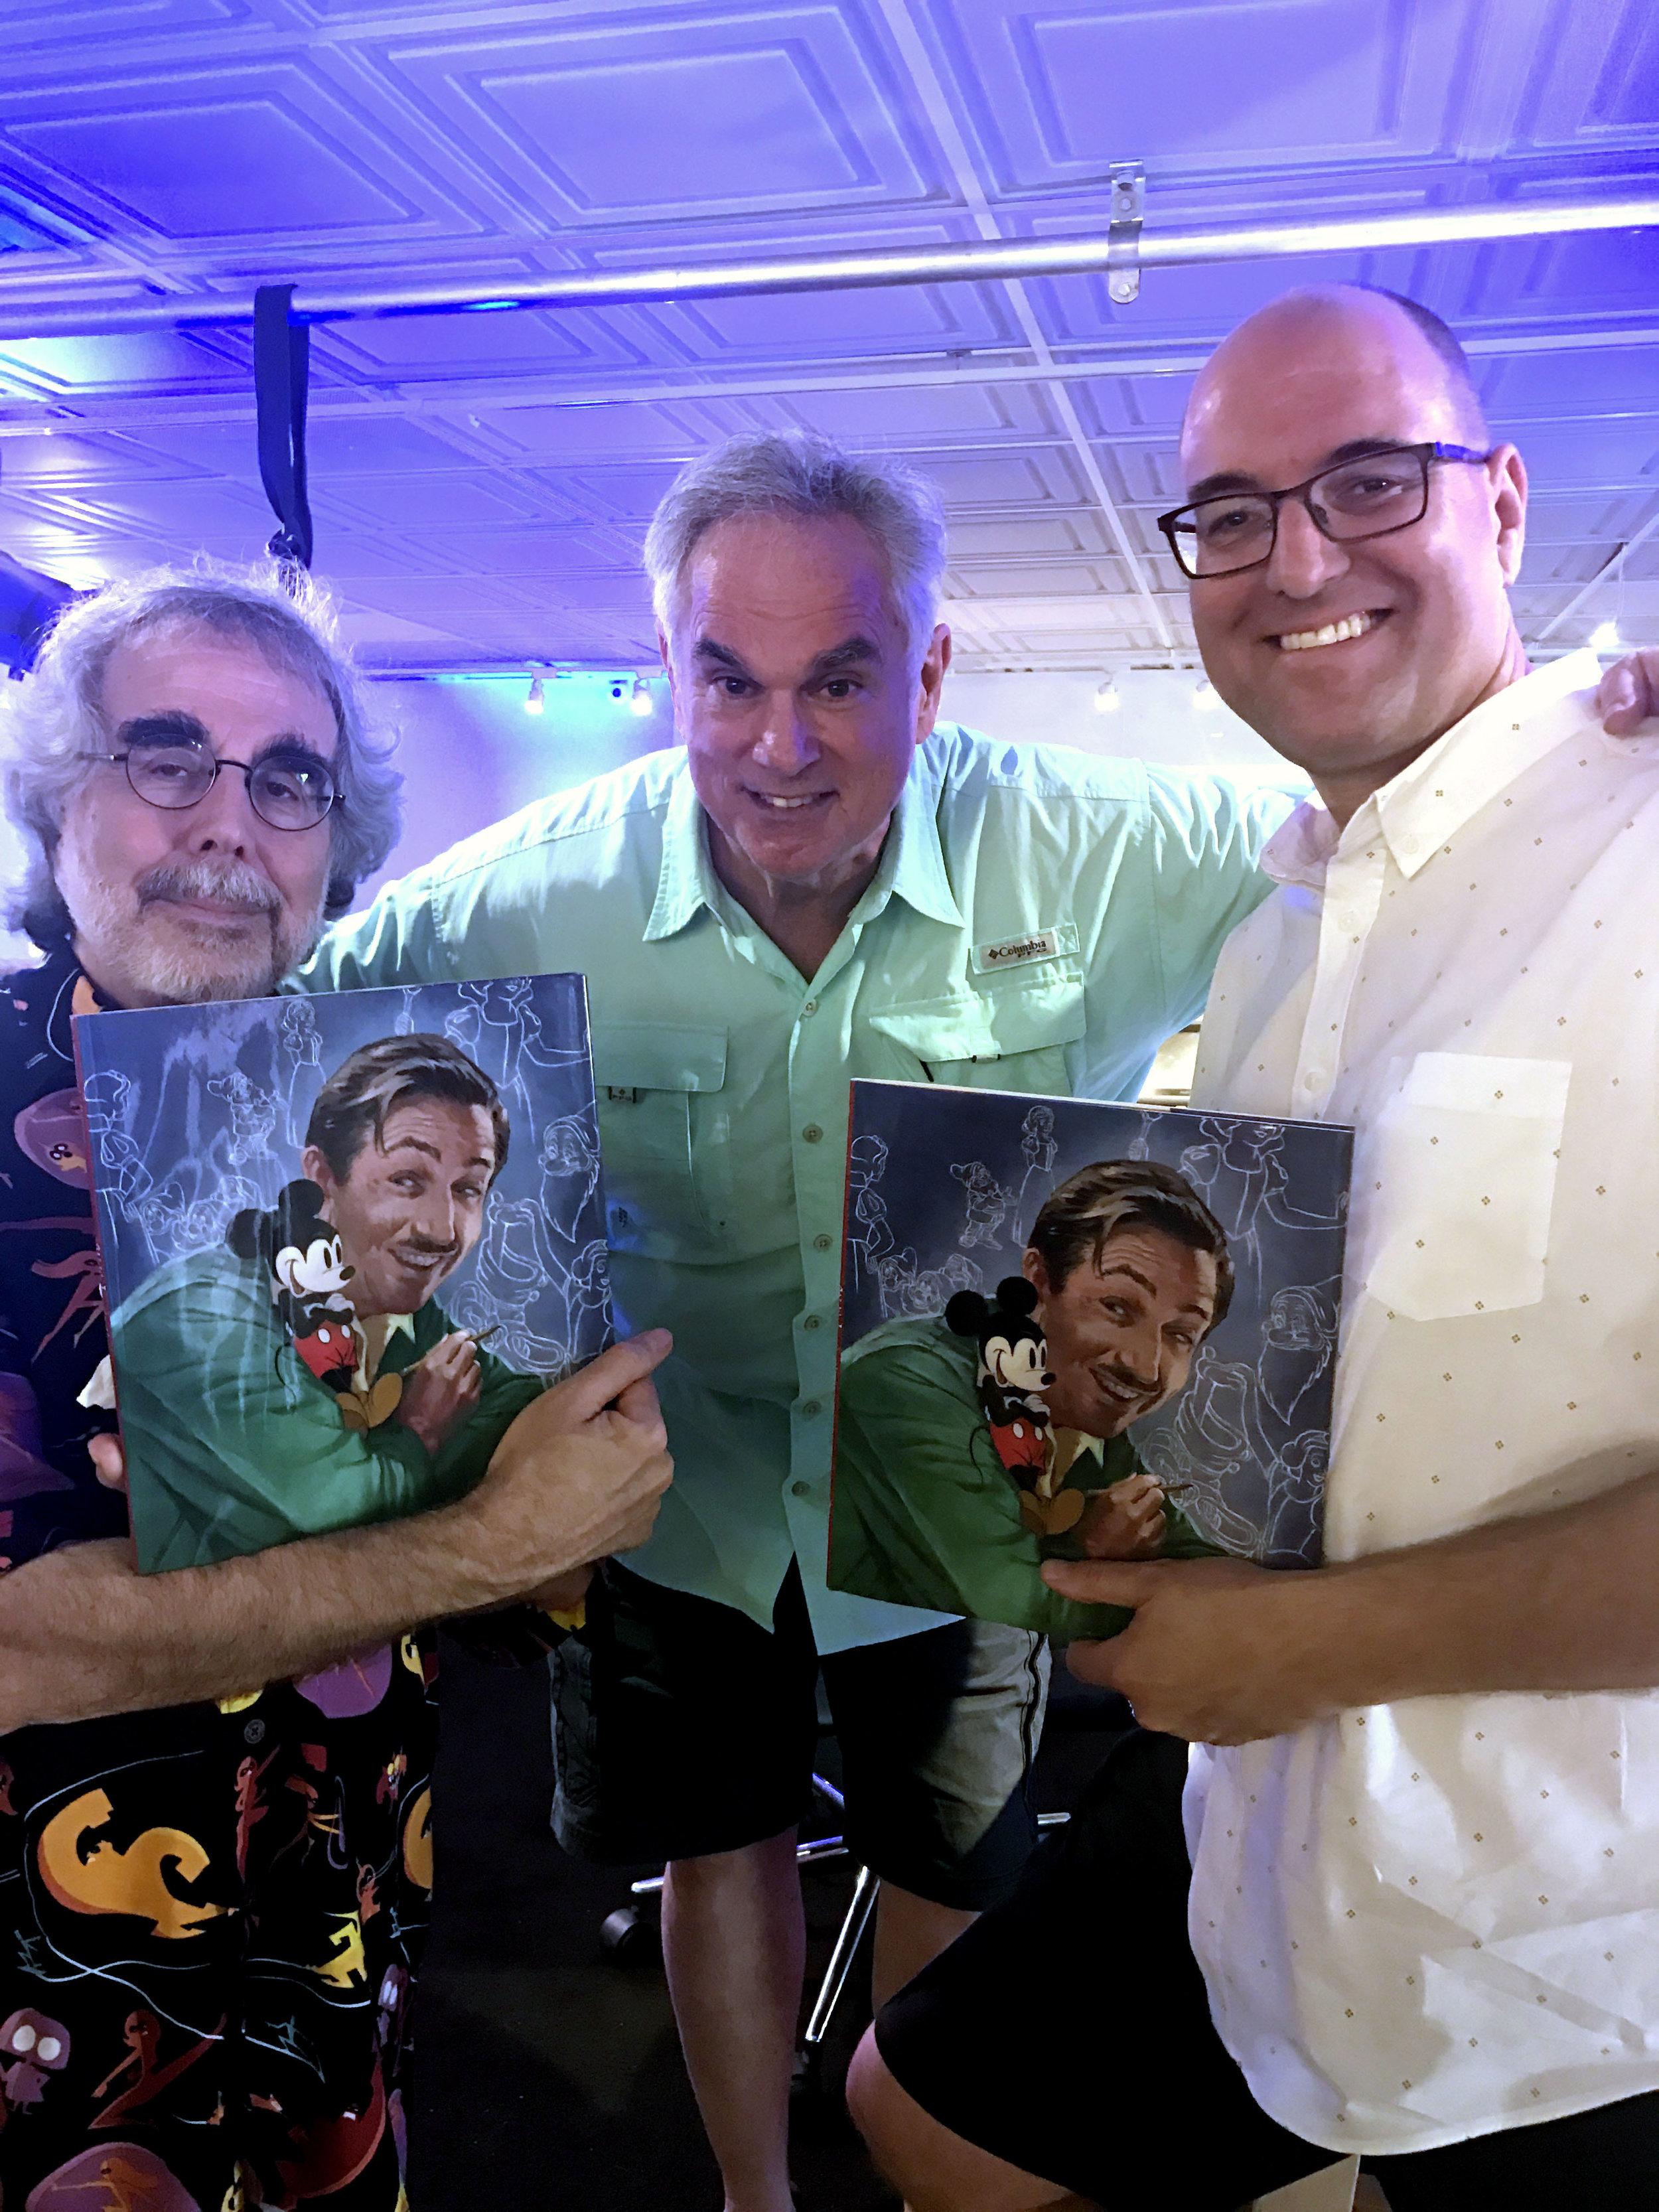 John with friends, Charles Solomon and Tony Bancroft.